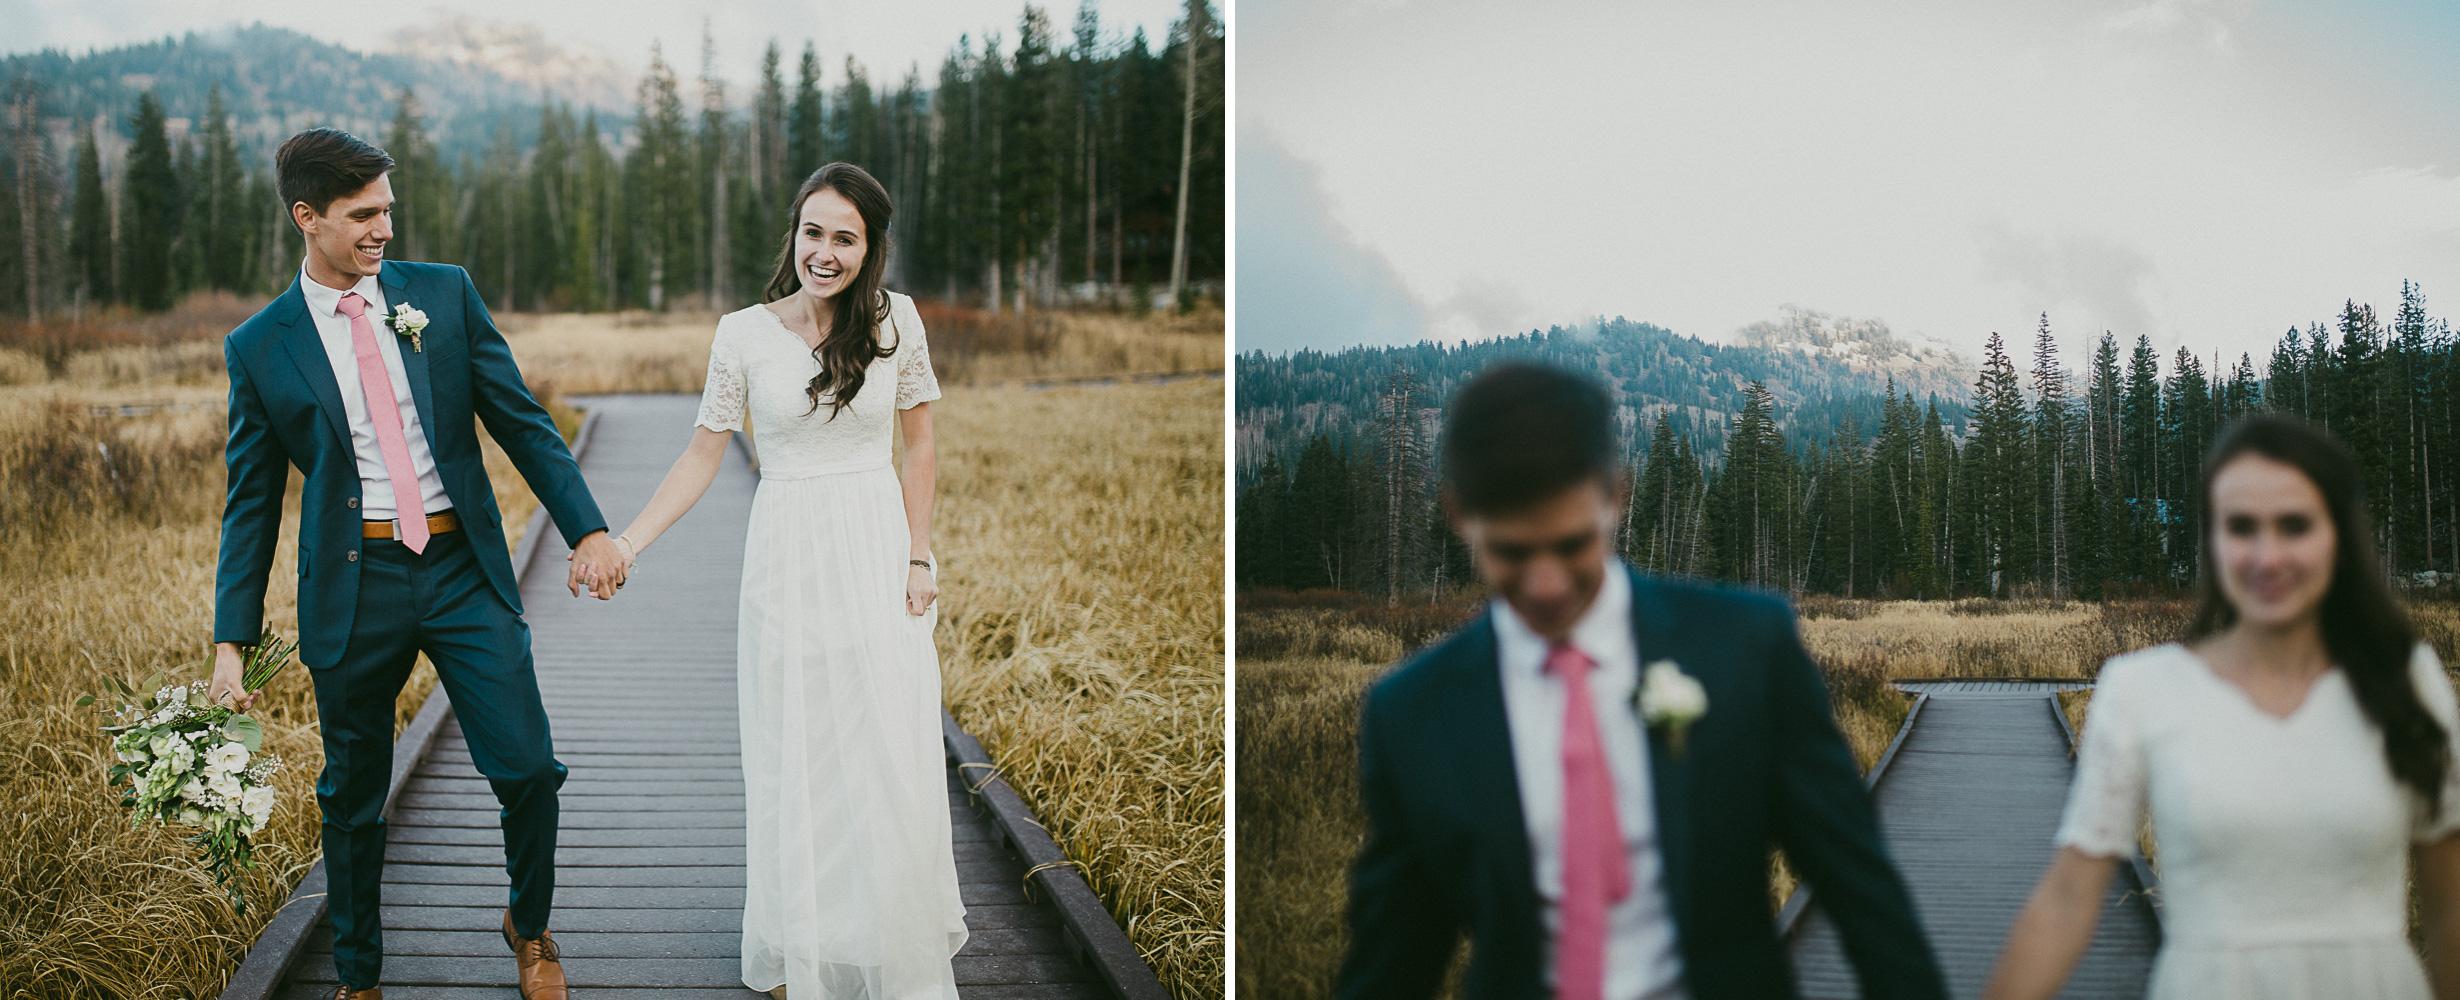 Salt-Lake-City-Wedding-Photographer-03.jpg